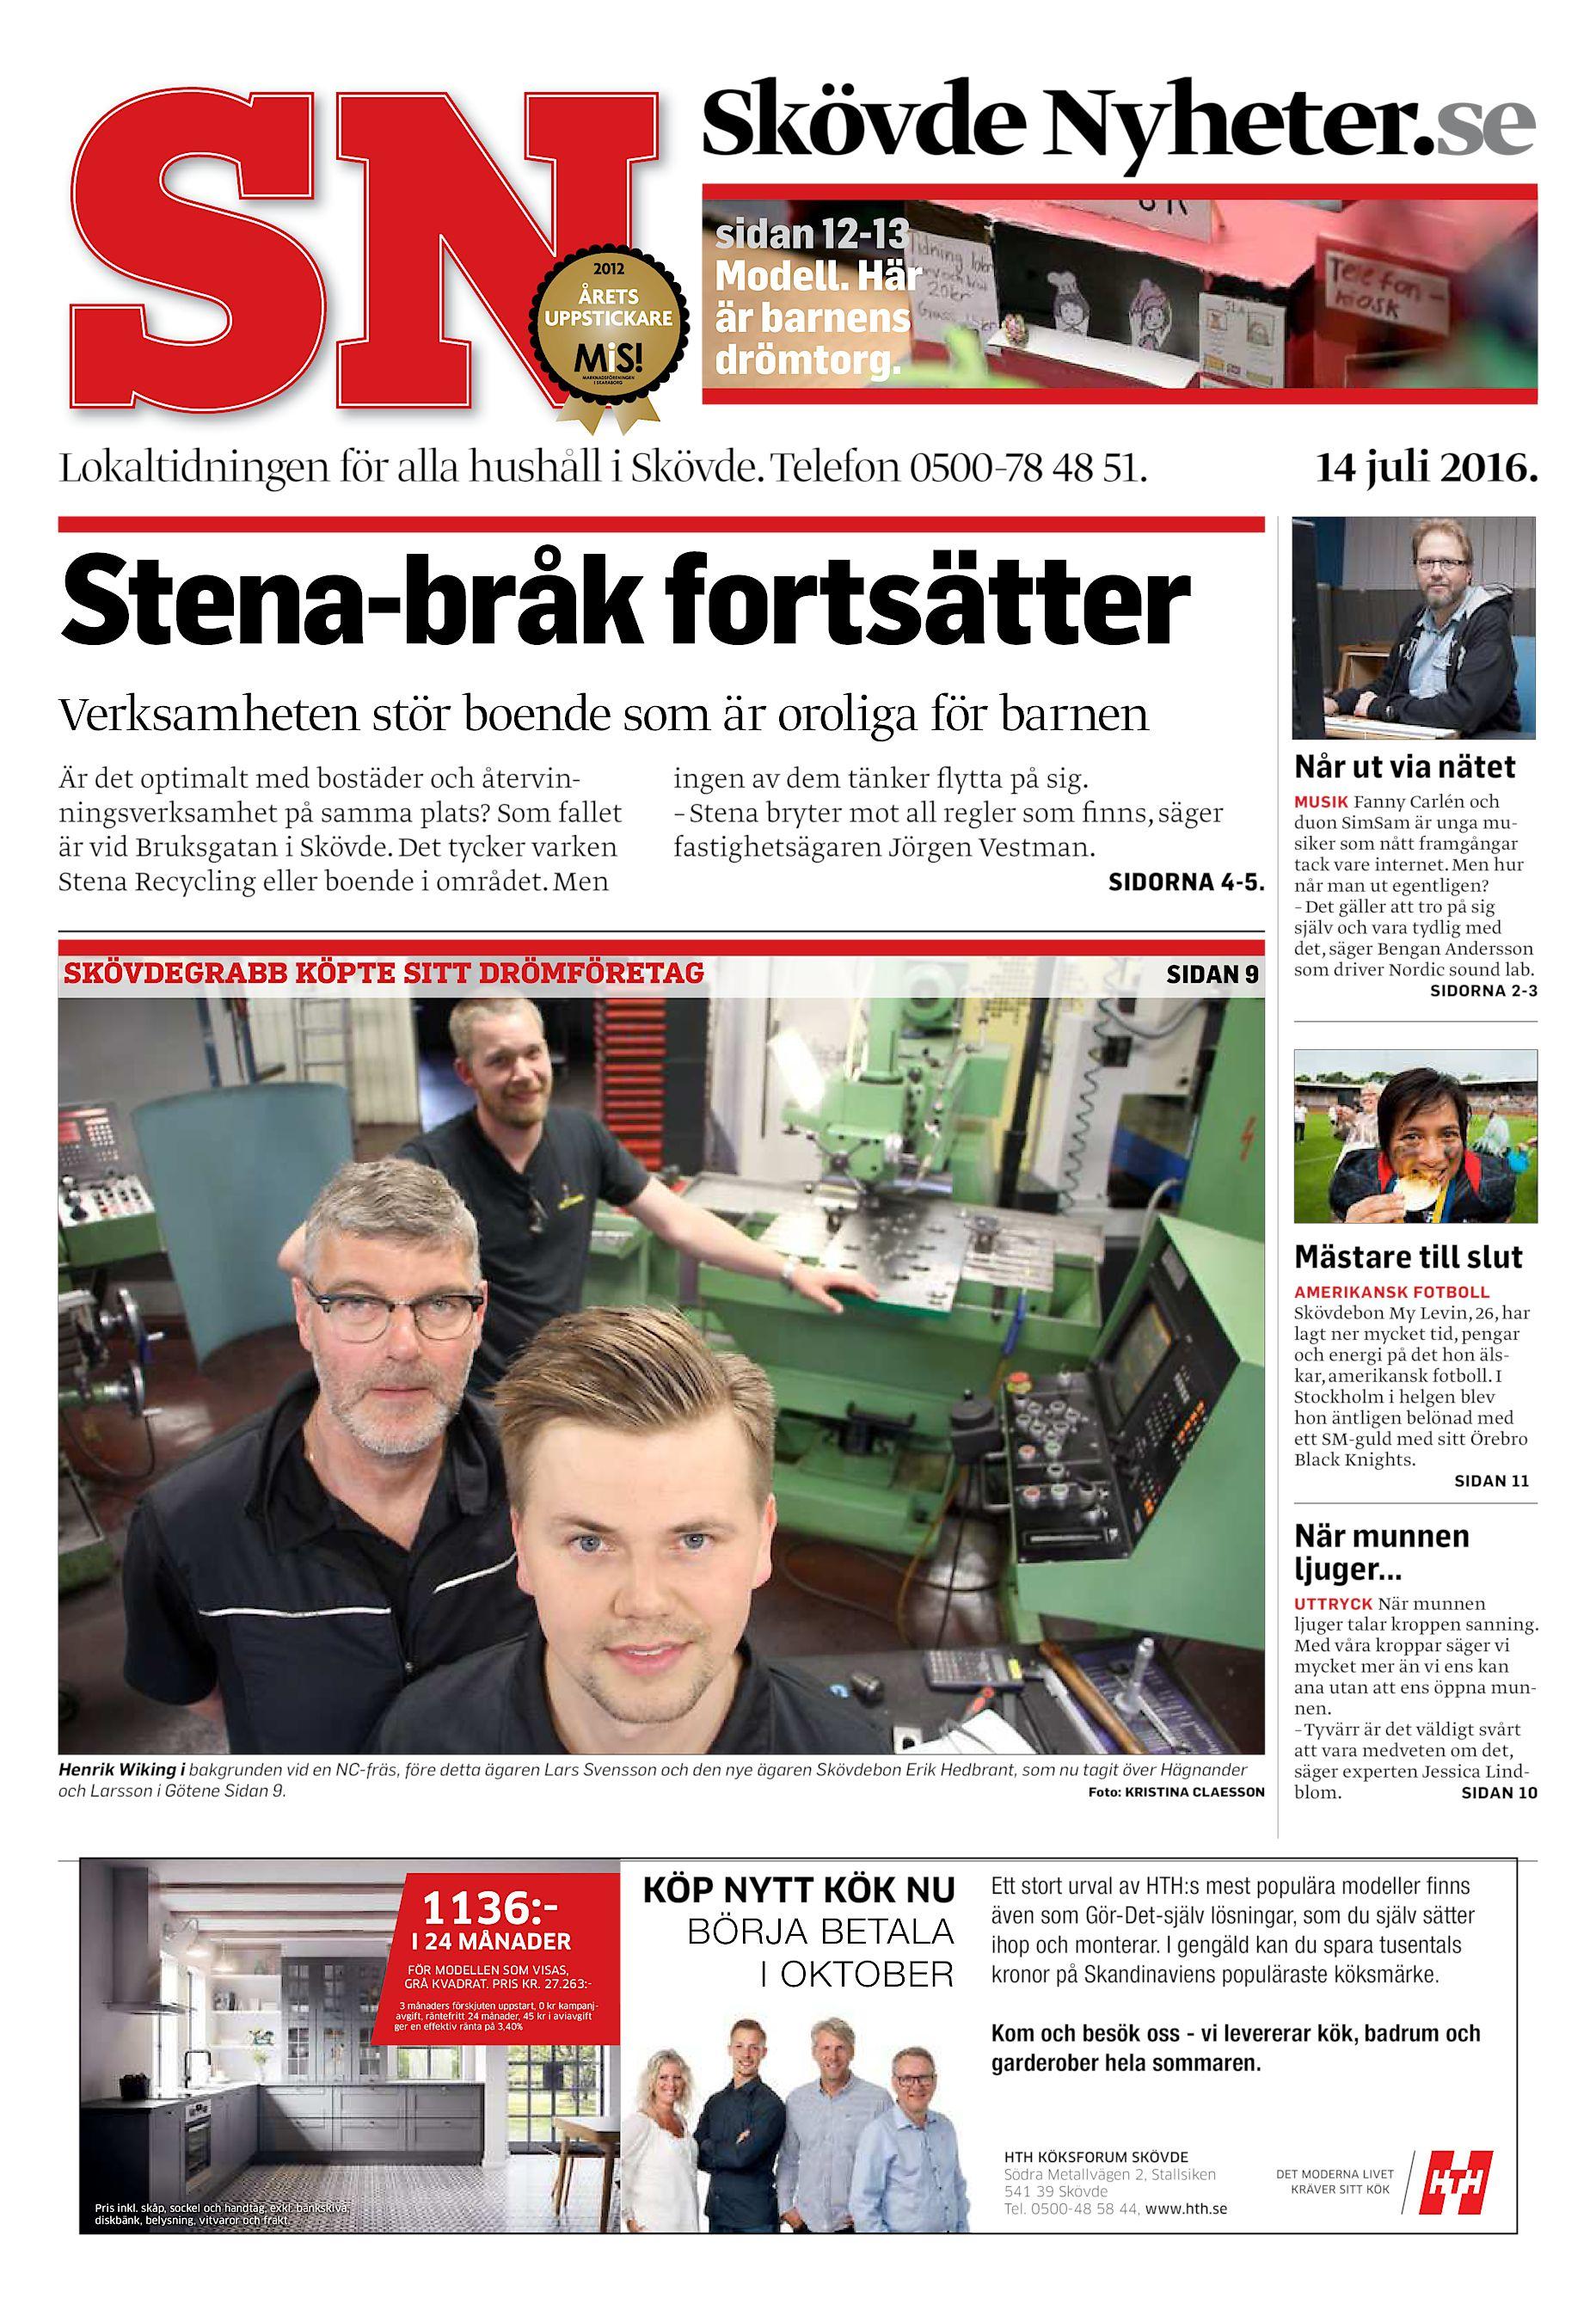 Skövde Nyheter SN-20160714 (endast text) 0cce188dd9817